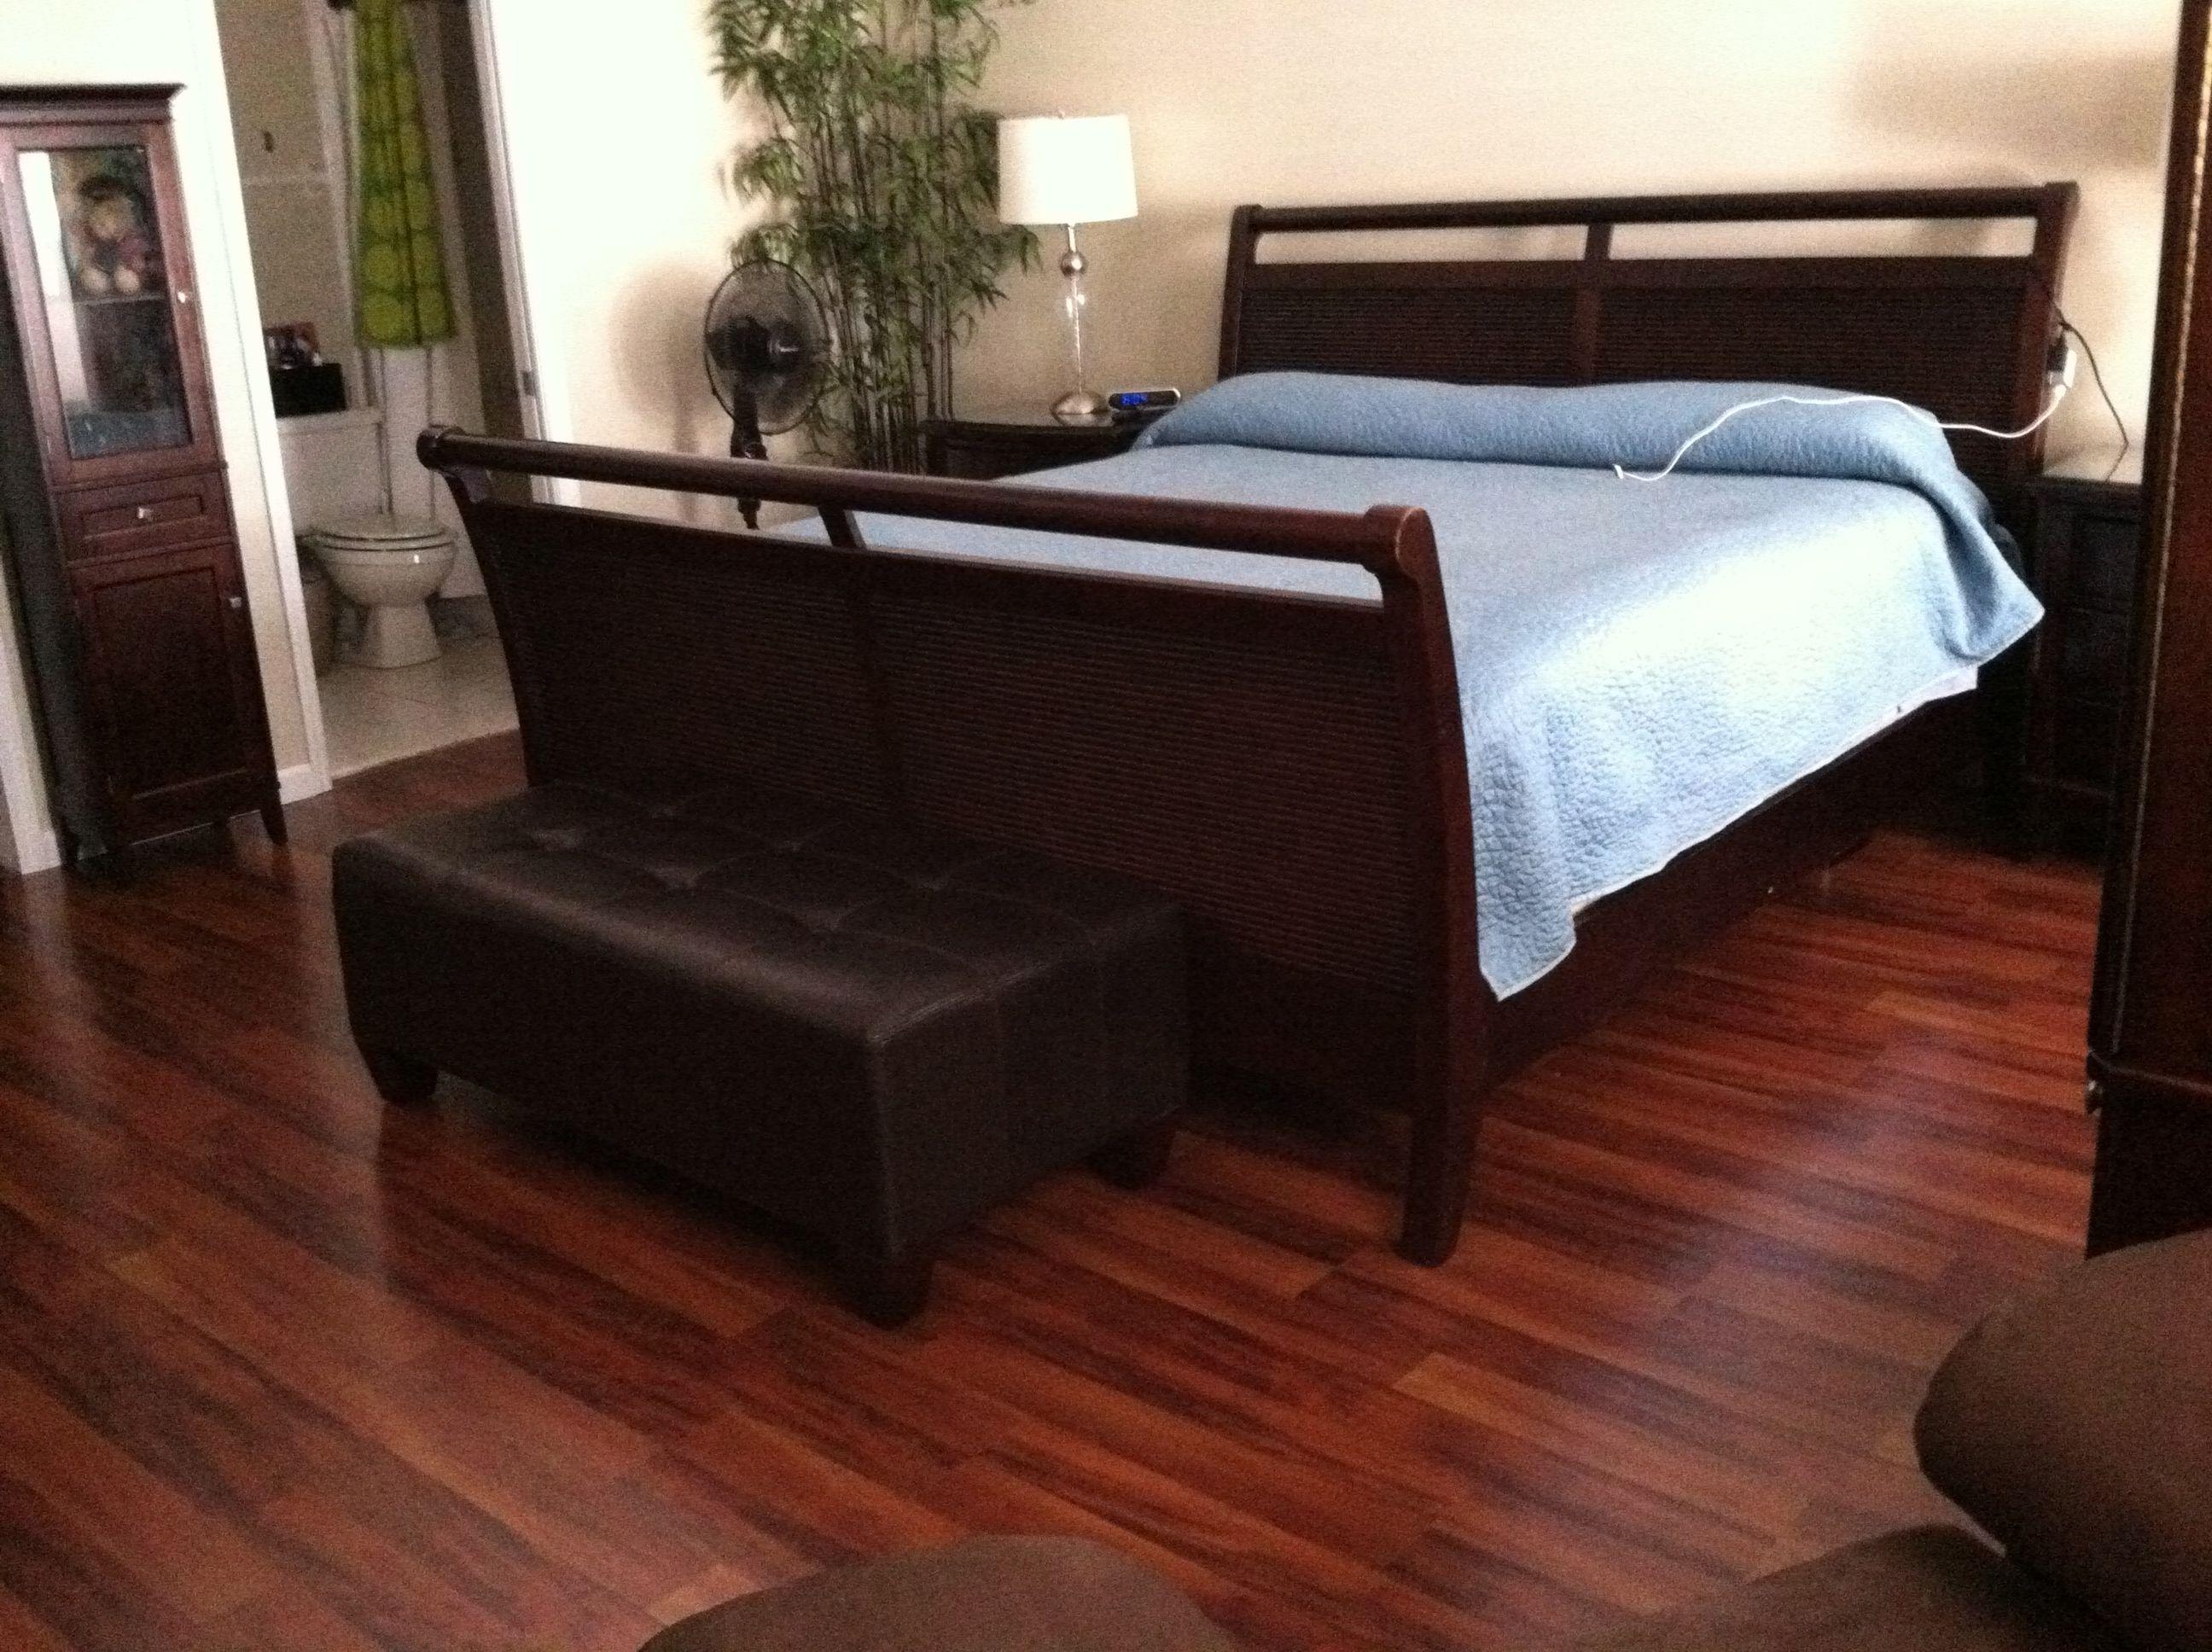 Enjoyable Brazilian Cherry Laminate Flooring Home Depot Randolph Home Interior And Landscaping Eliaenasavecom